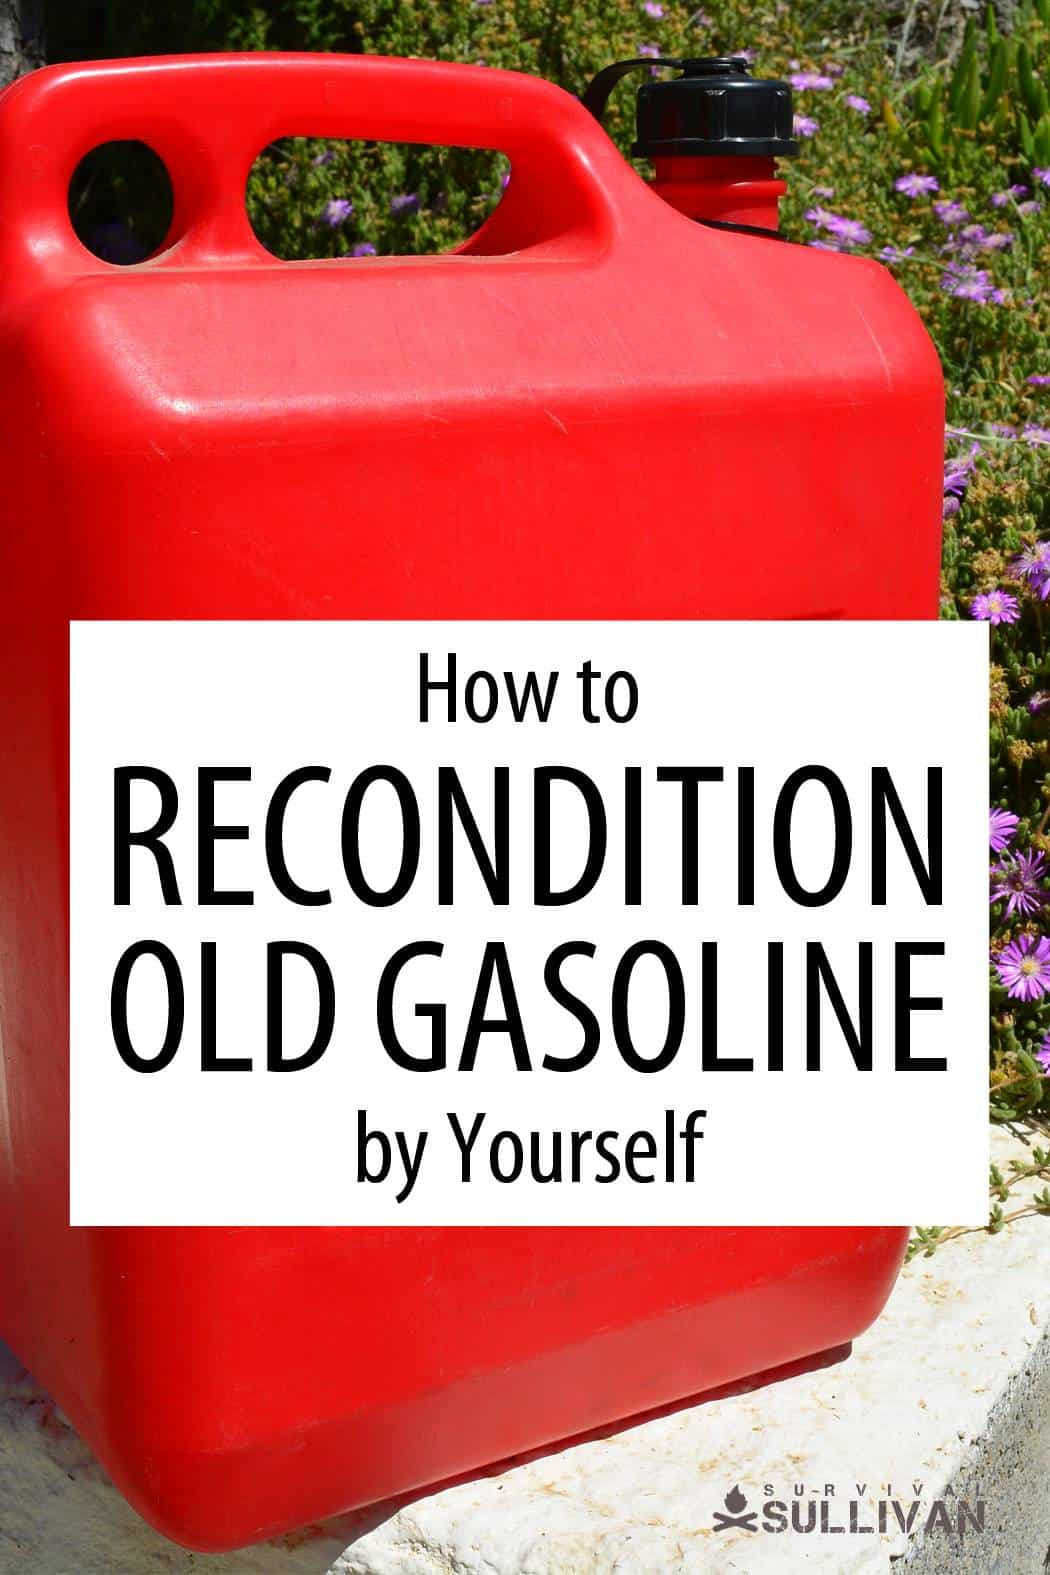 reconditioning gasoline Pinterest image